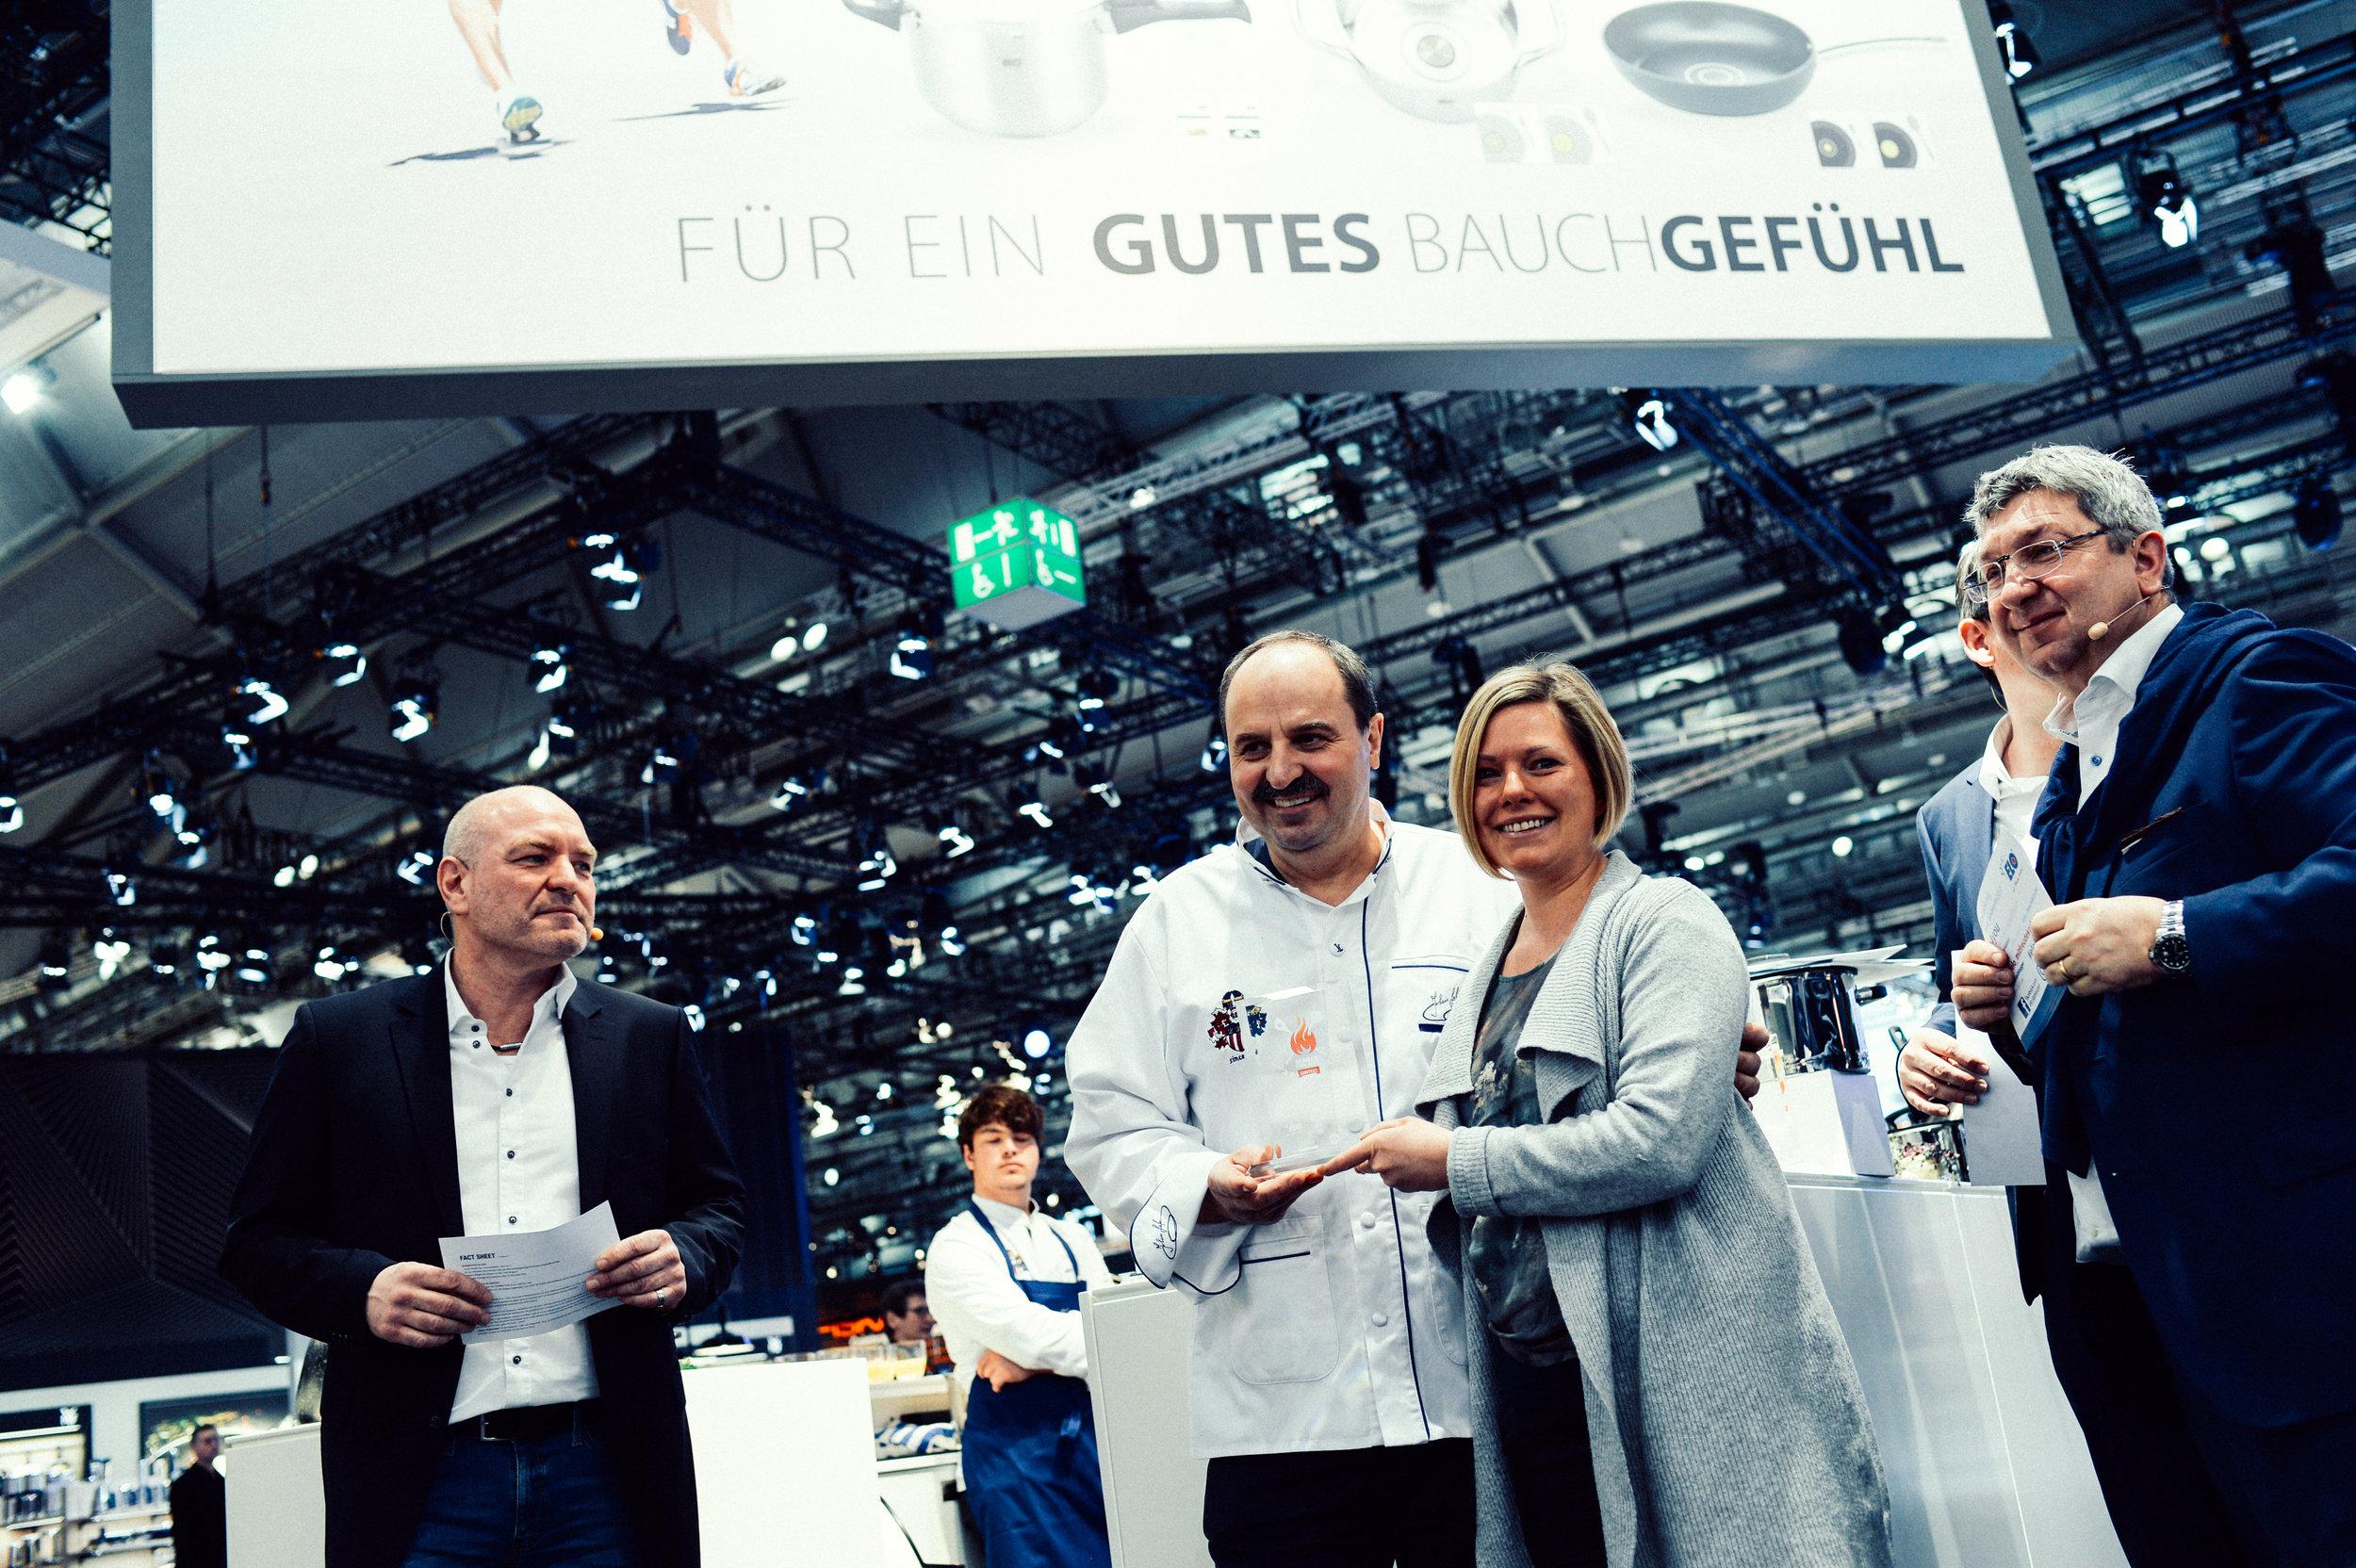 german_food_blog_contest-18.jpg